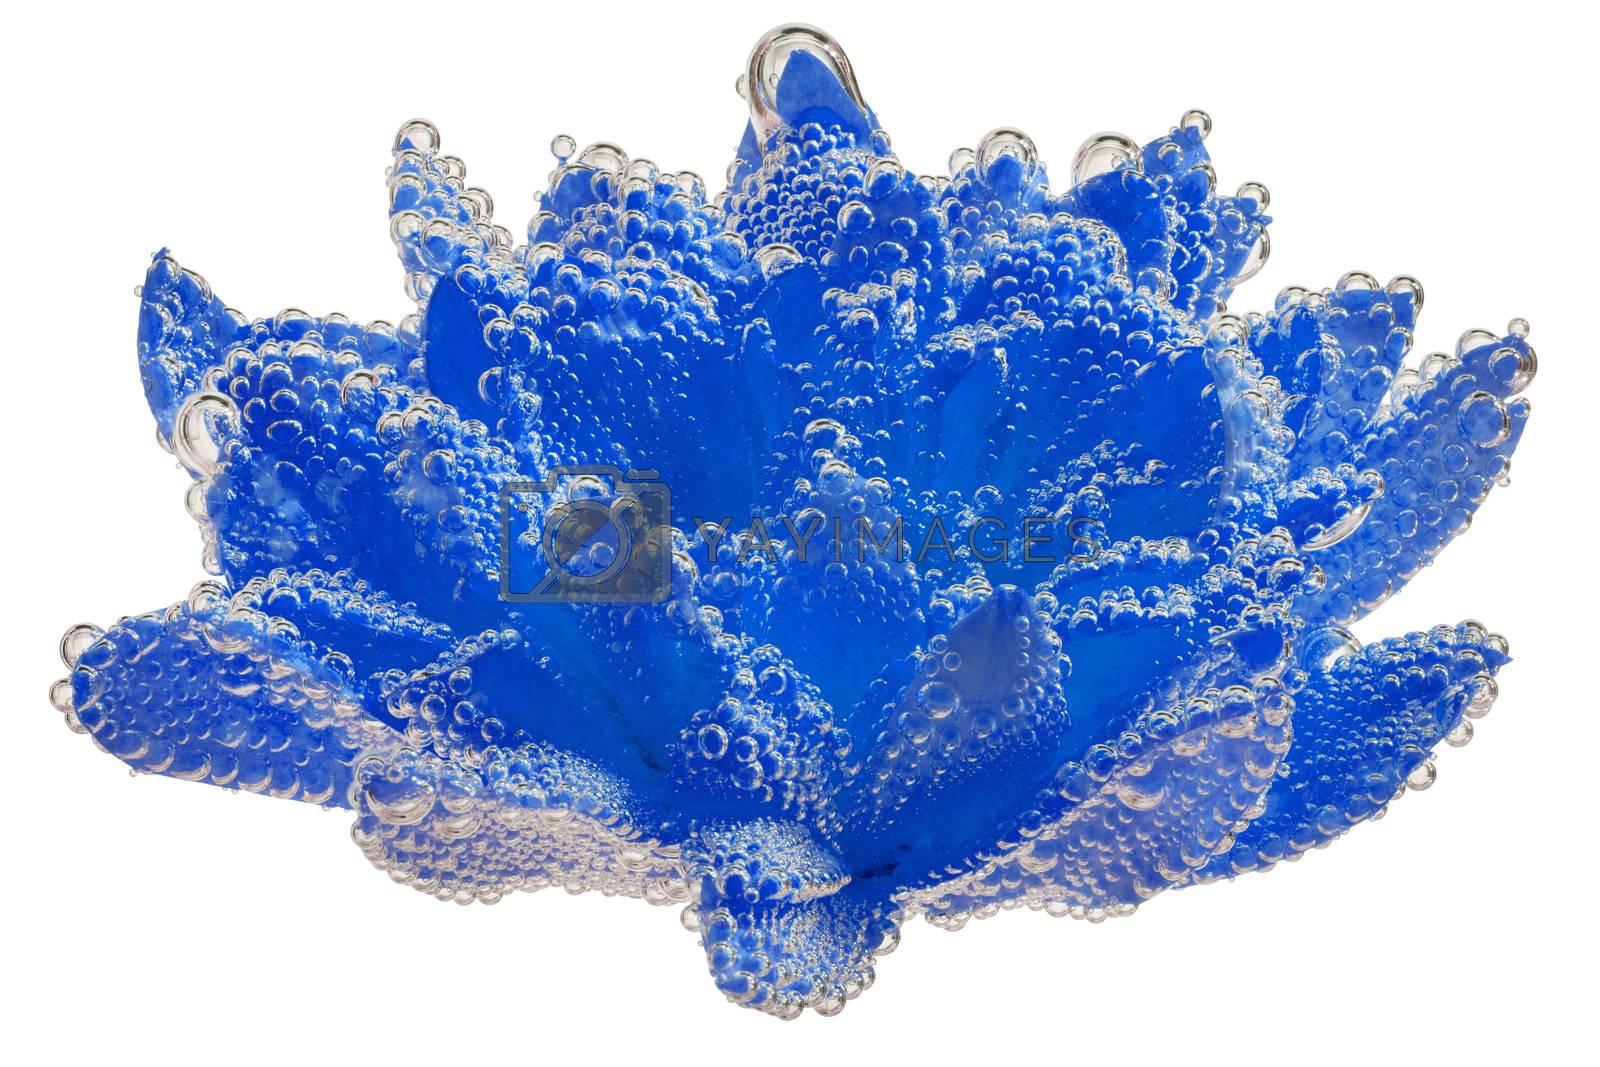 phantom blue chrysanthemum coverd by air bubbles underwater on white background